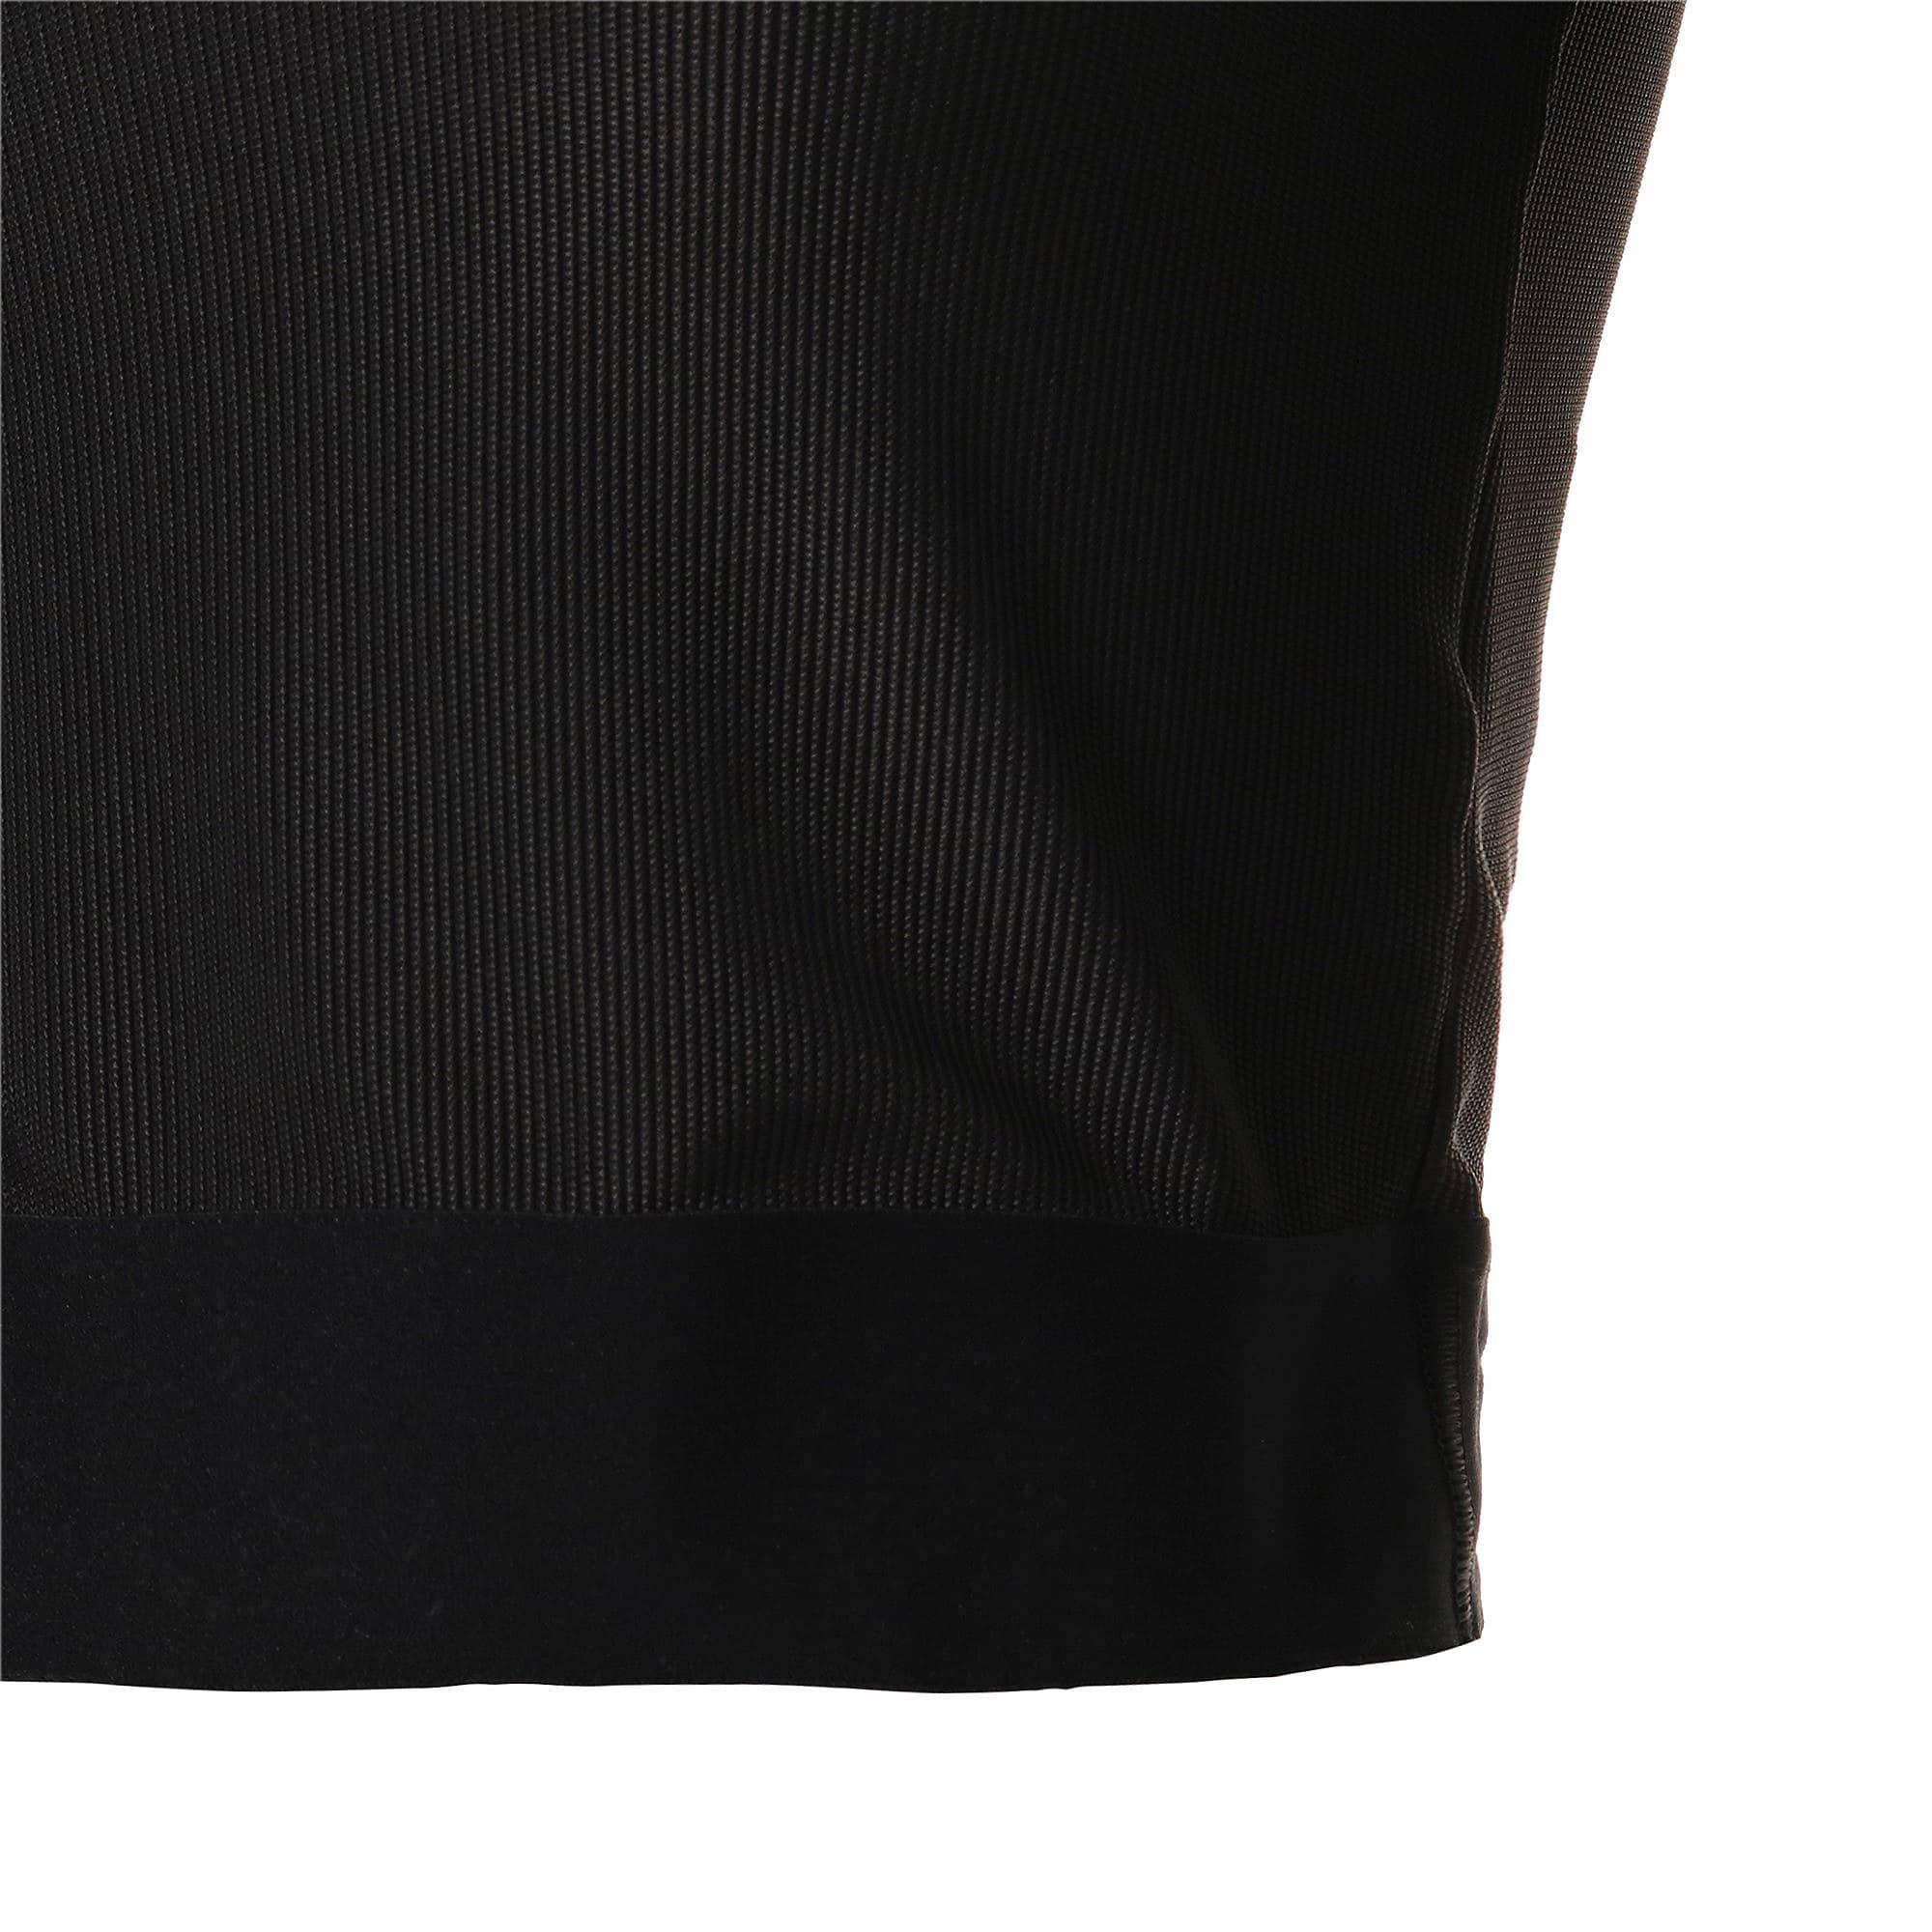 Thumbnail 9 of CLASSICS ウィメンズ リブ LS Tシャツ 長袖, Puma Black, medium-JPN